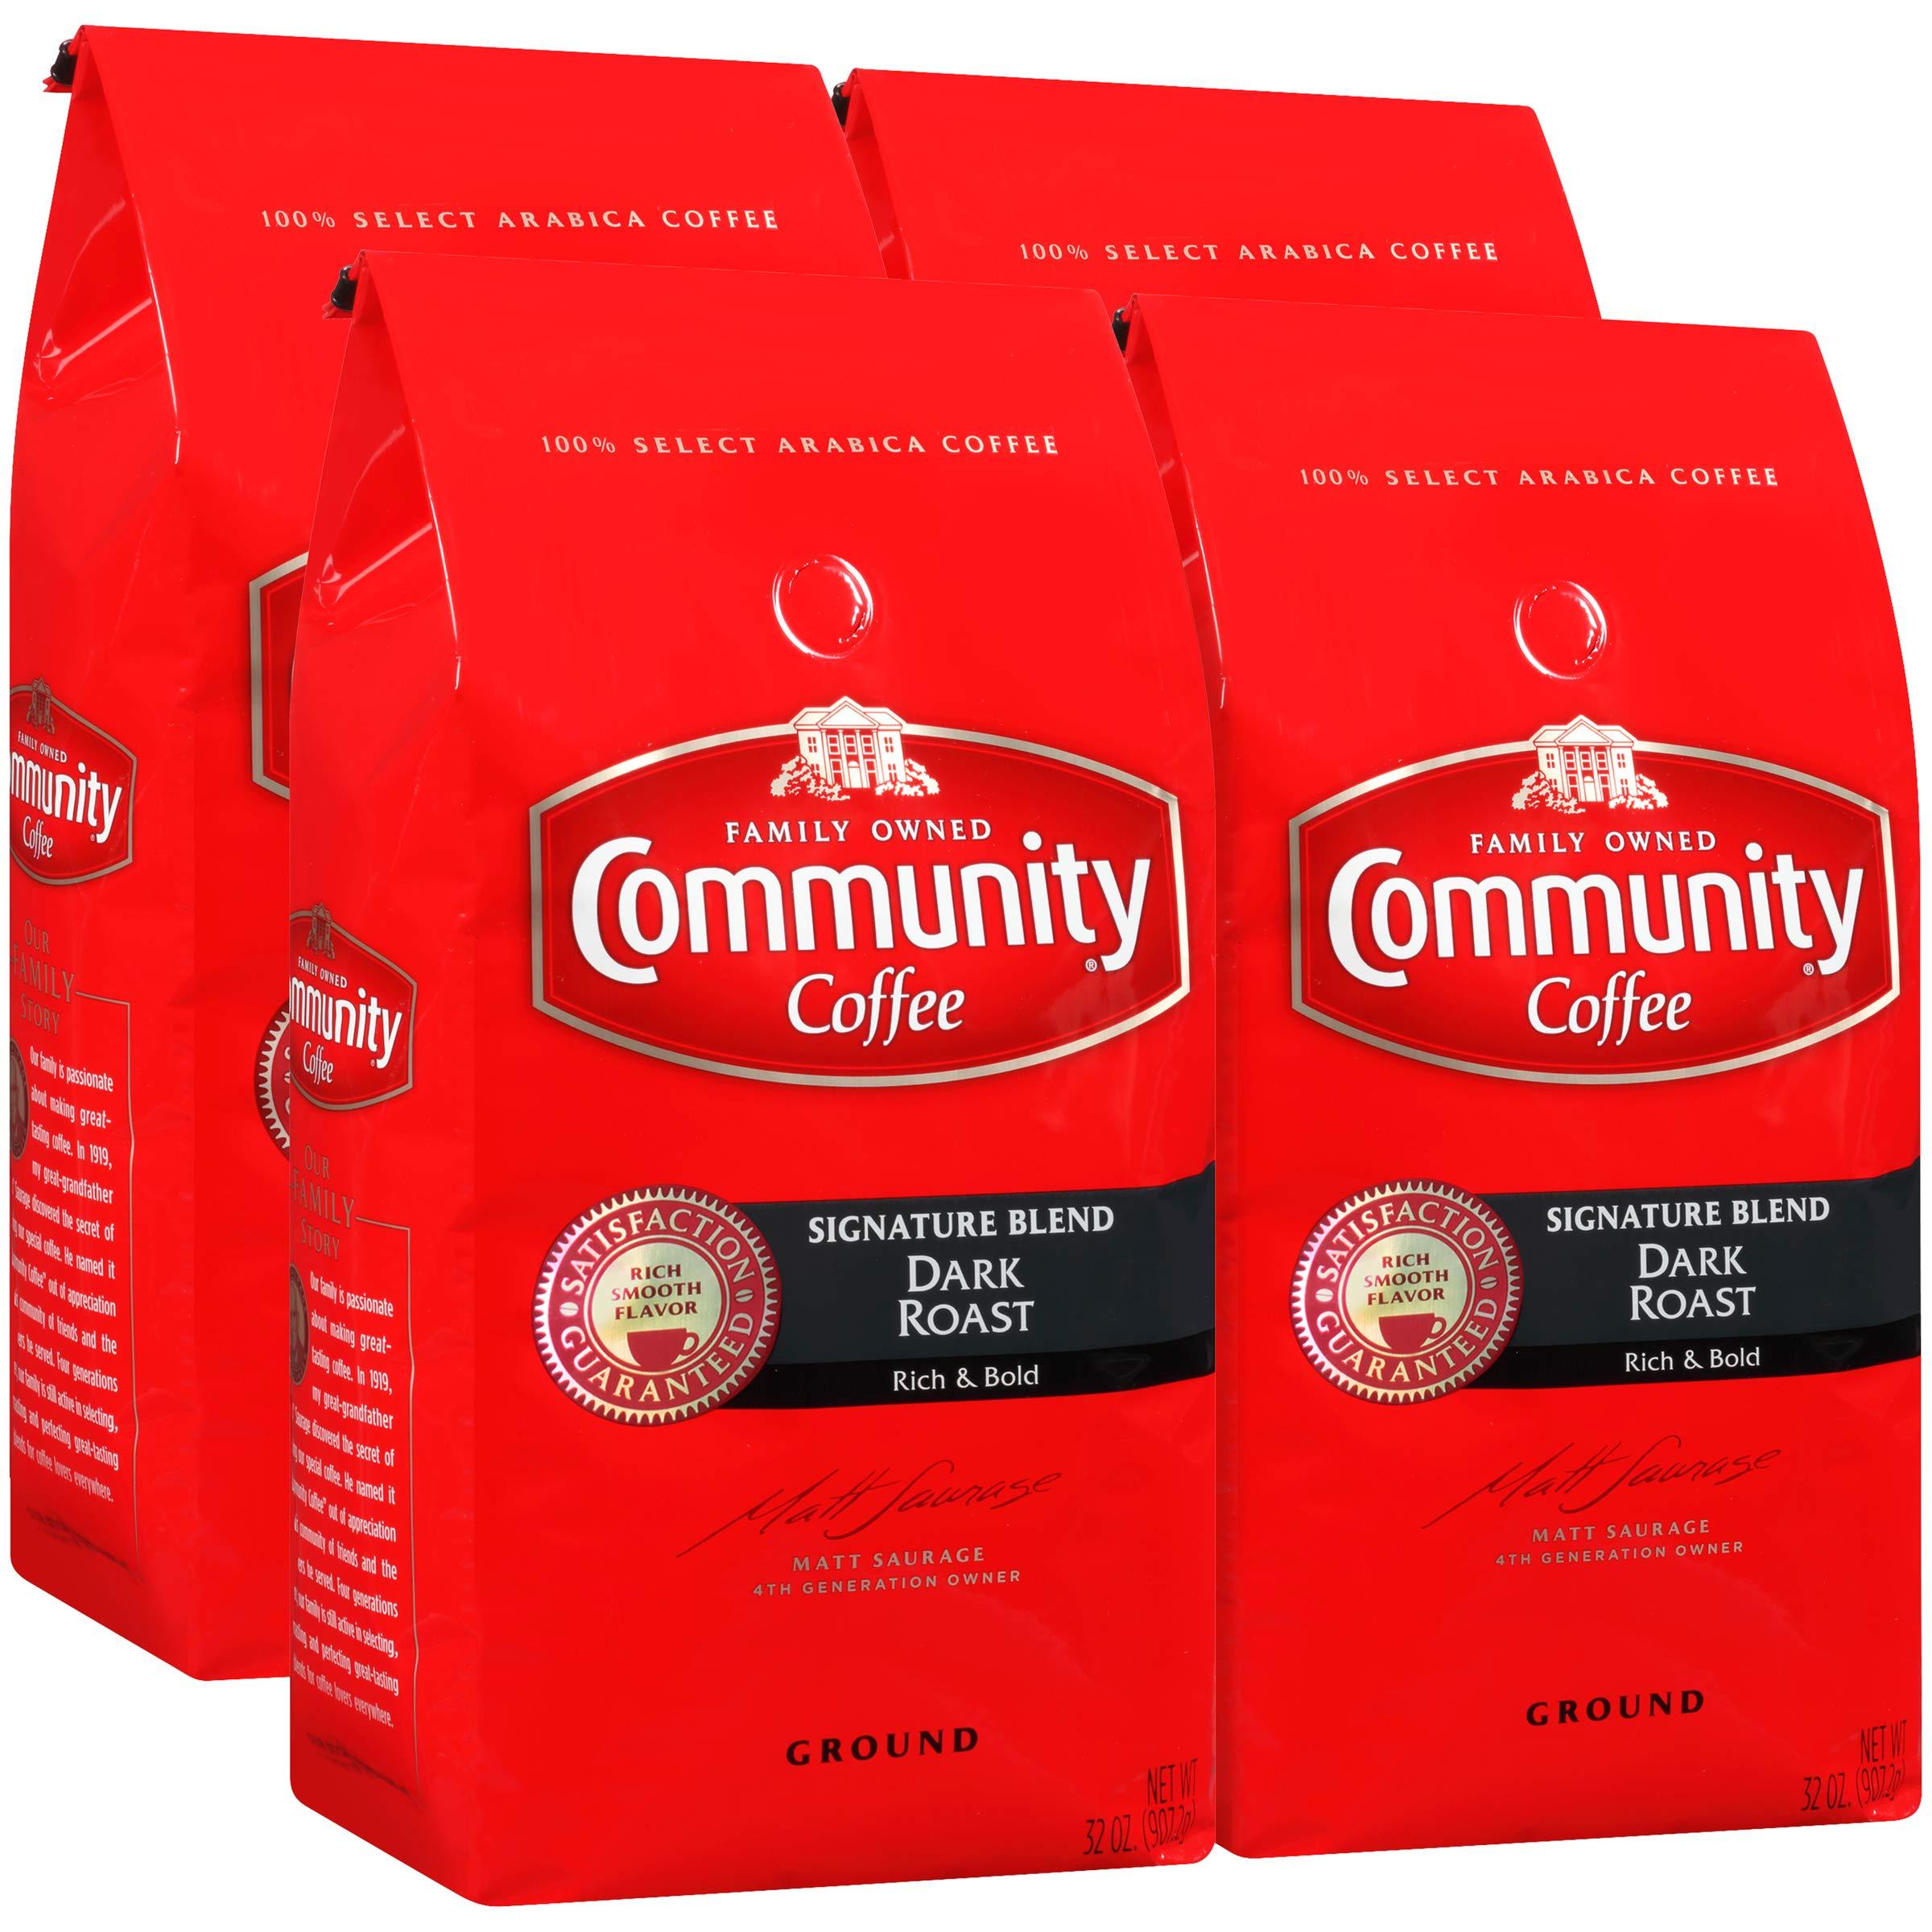 Community Coffee Signature Blend Dark Roast Premium Ground 32 Oz Bag (4 Pack), Full Body Rich Bold Taste, 100% Select Arabica Coffee Beans